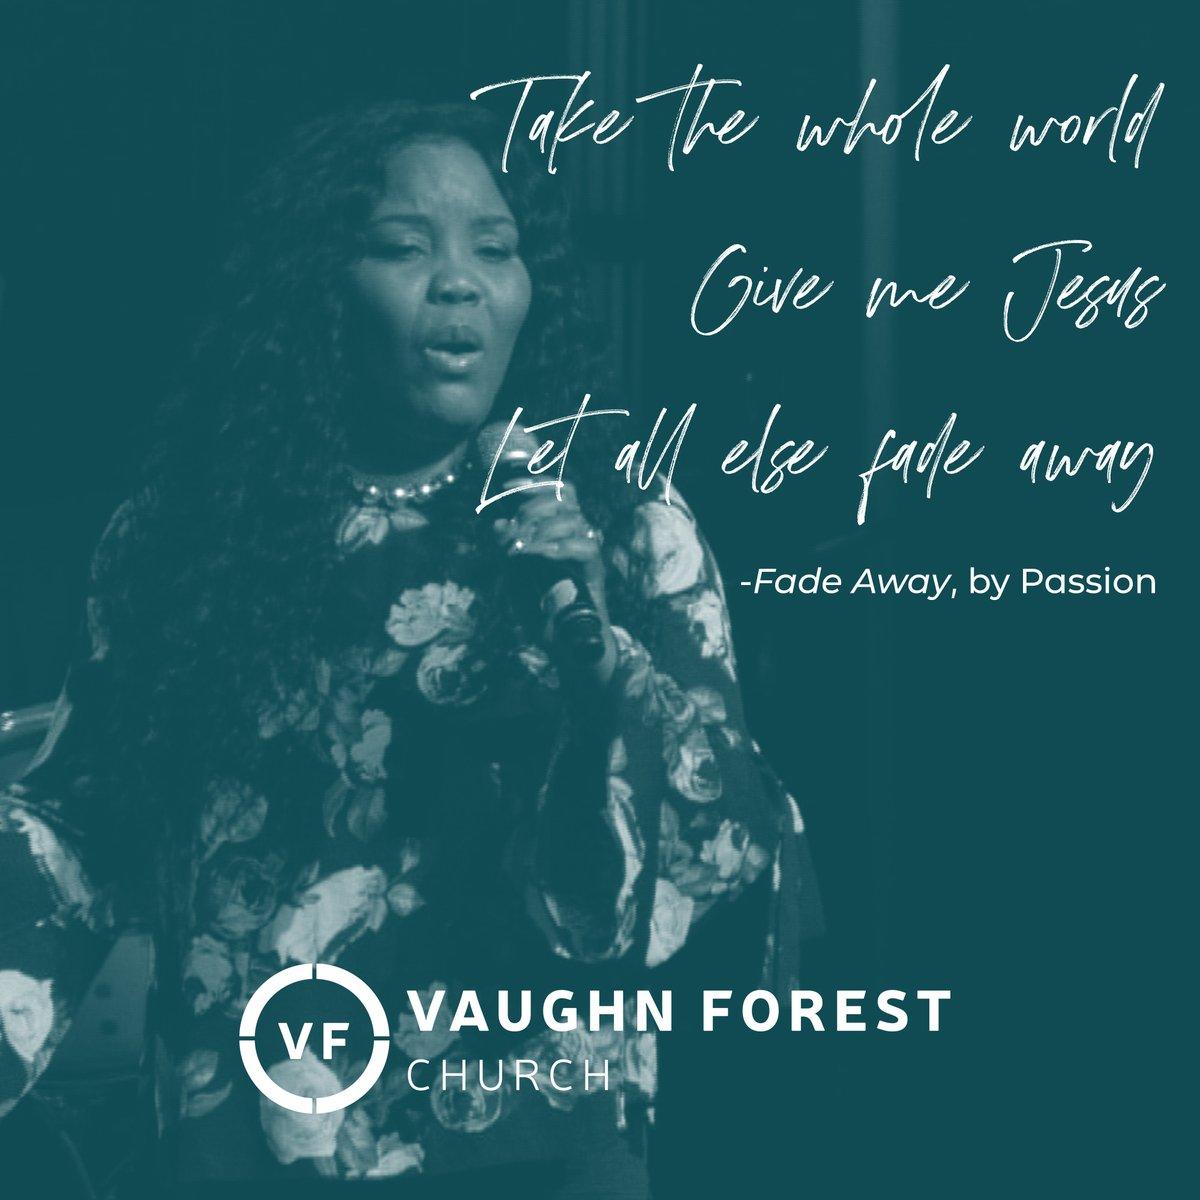 Give me Jesus! #VaughnForestChurch #FinancialFreedom pic.twitter.com/SIcgOsAN6J